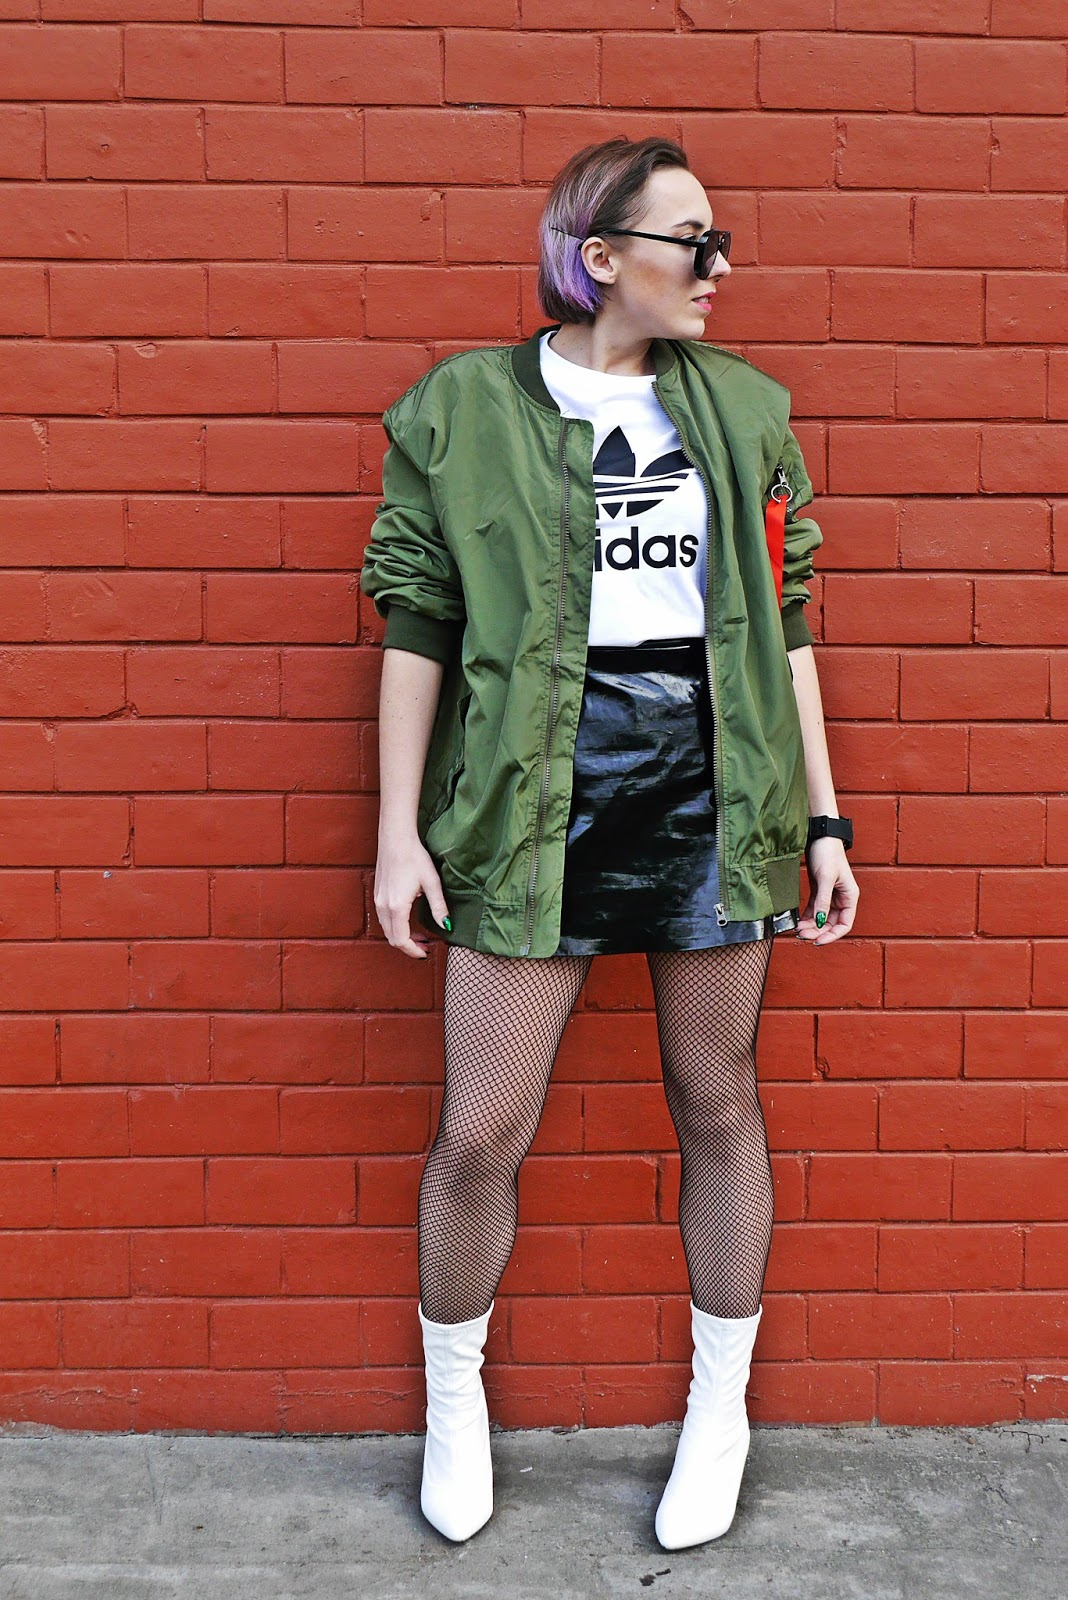 8_zielona_oversize_bomberka_top_adidas_biale_botki_renee_karyn_blog_modowy_080318a